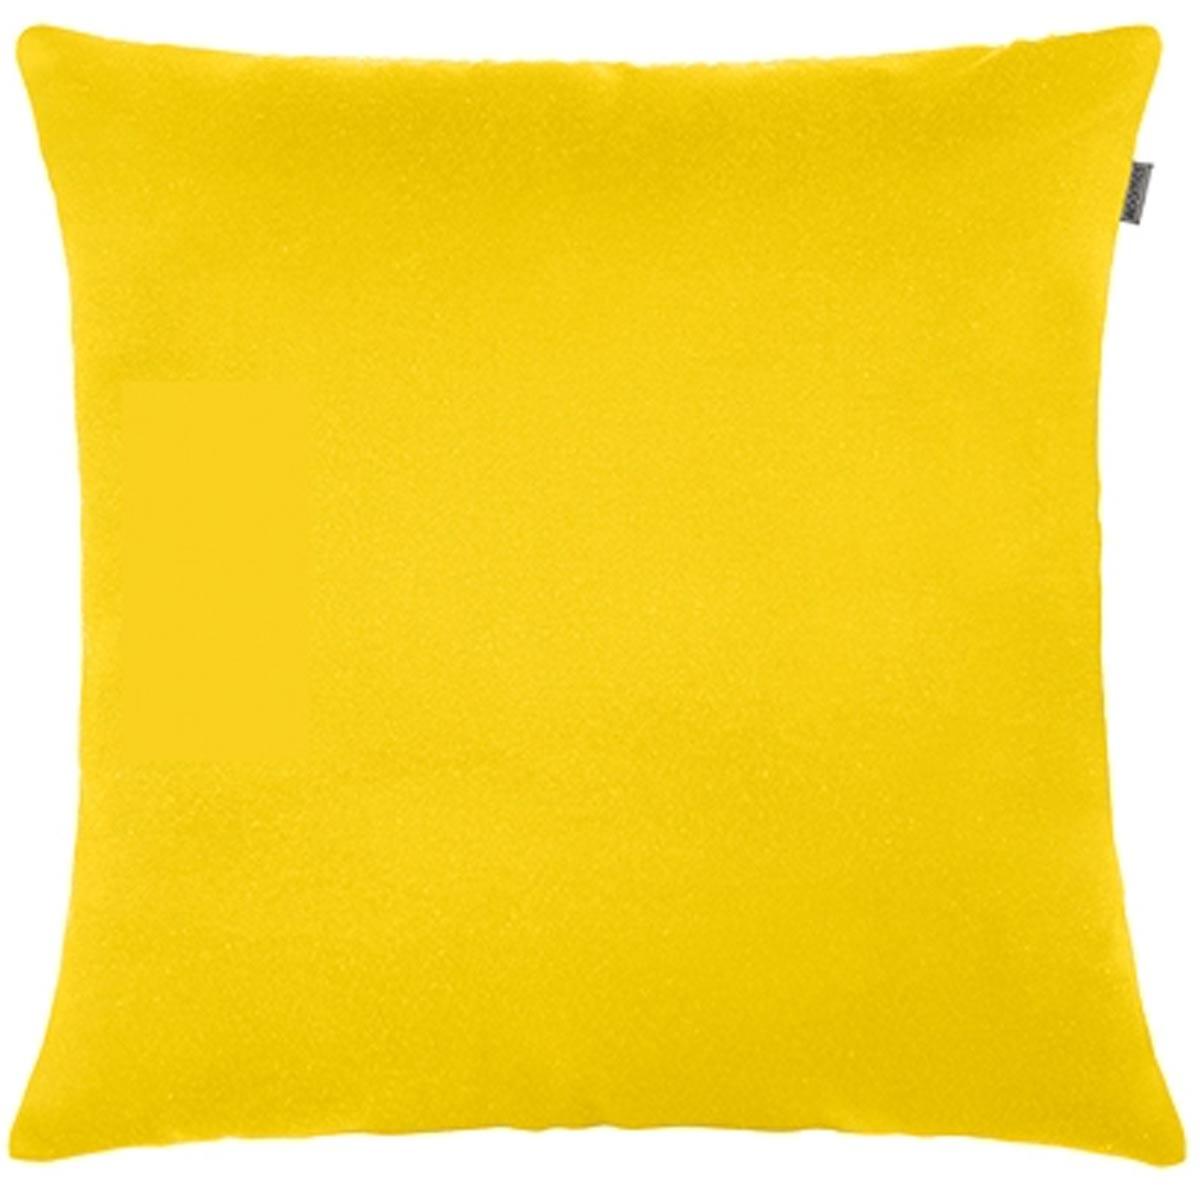 Capa P/ Almofada Jacquard Liso 45cm X 45cm Amarelo Adomes